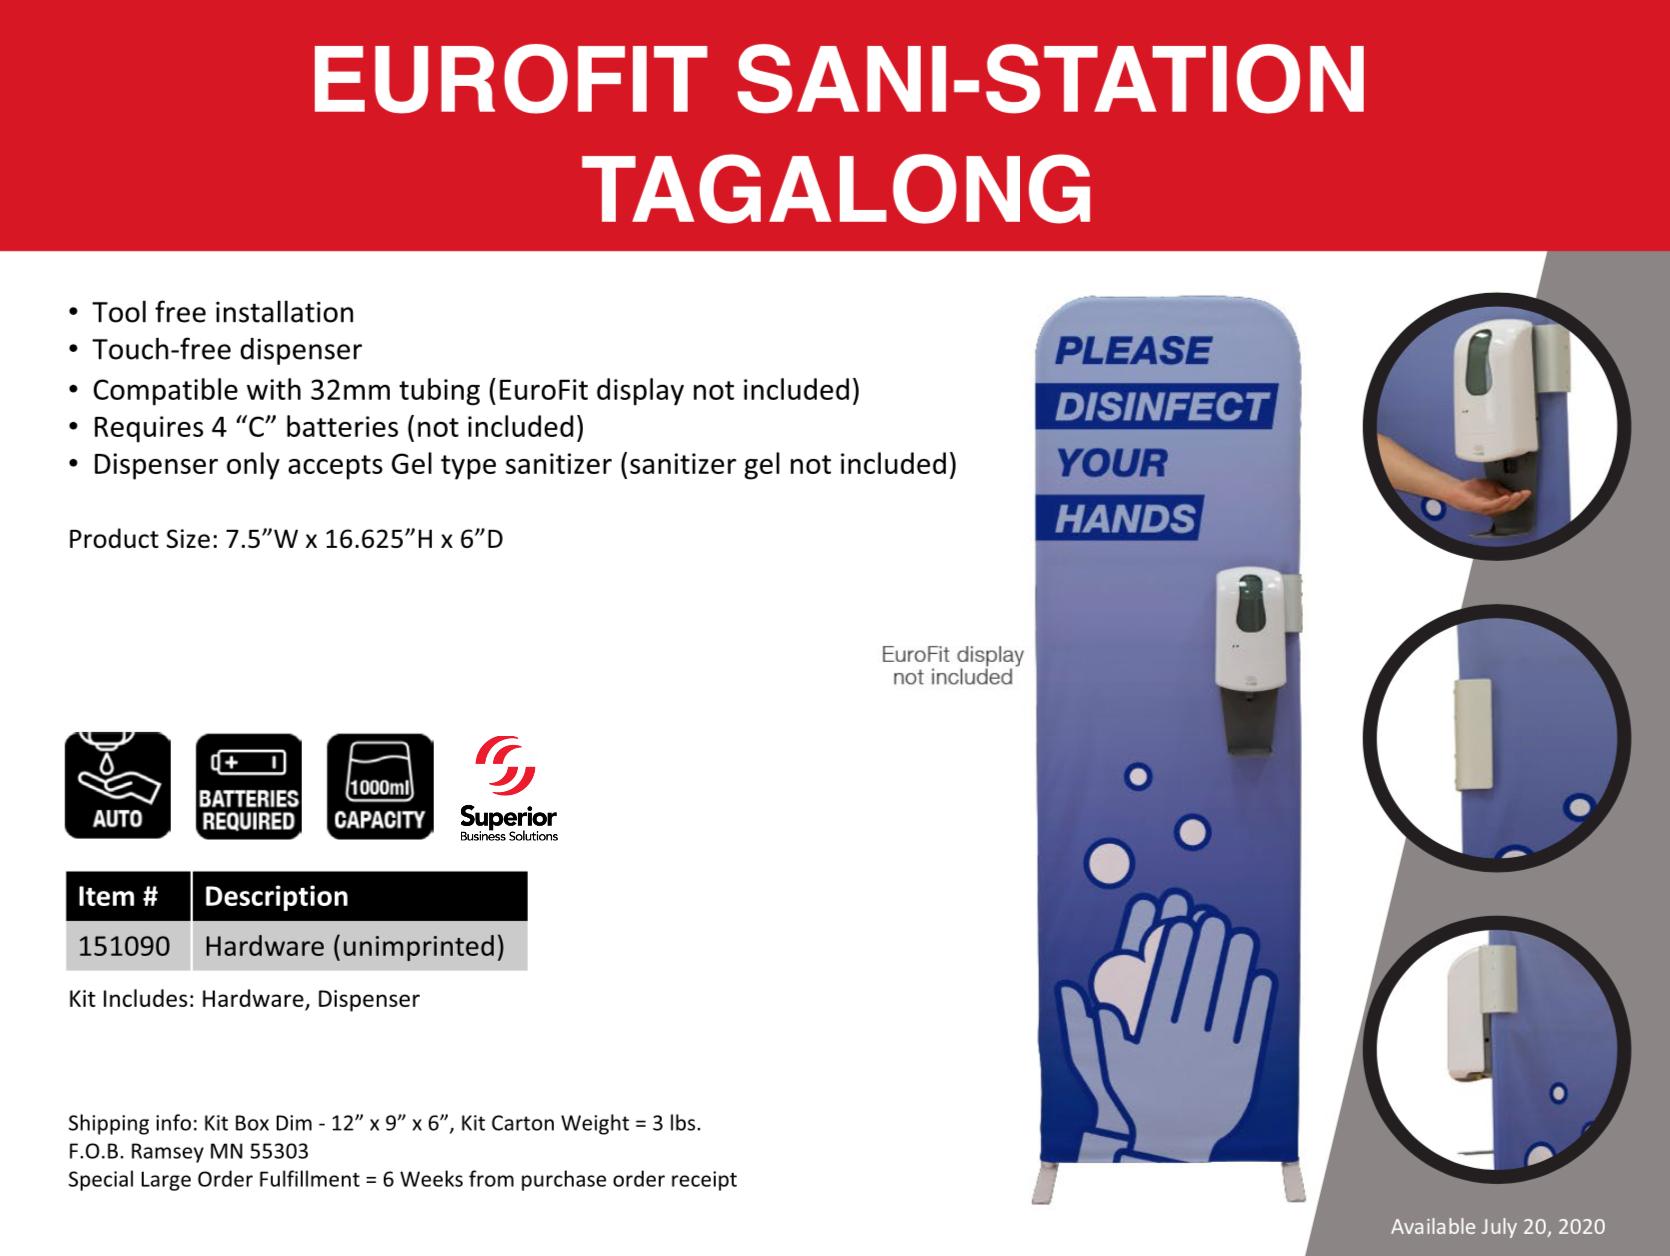 eurofit-sani-station-tagalong-for-gel-sanitizer